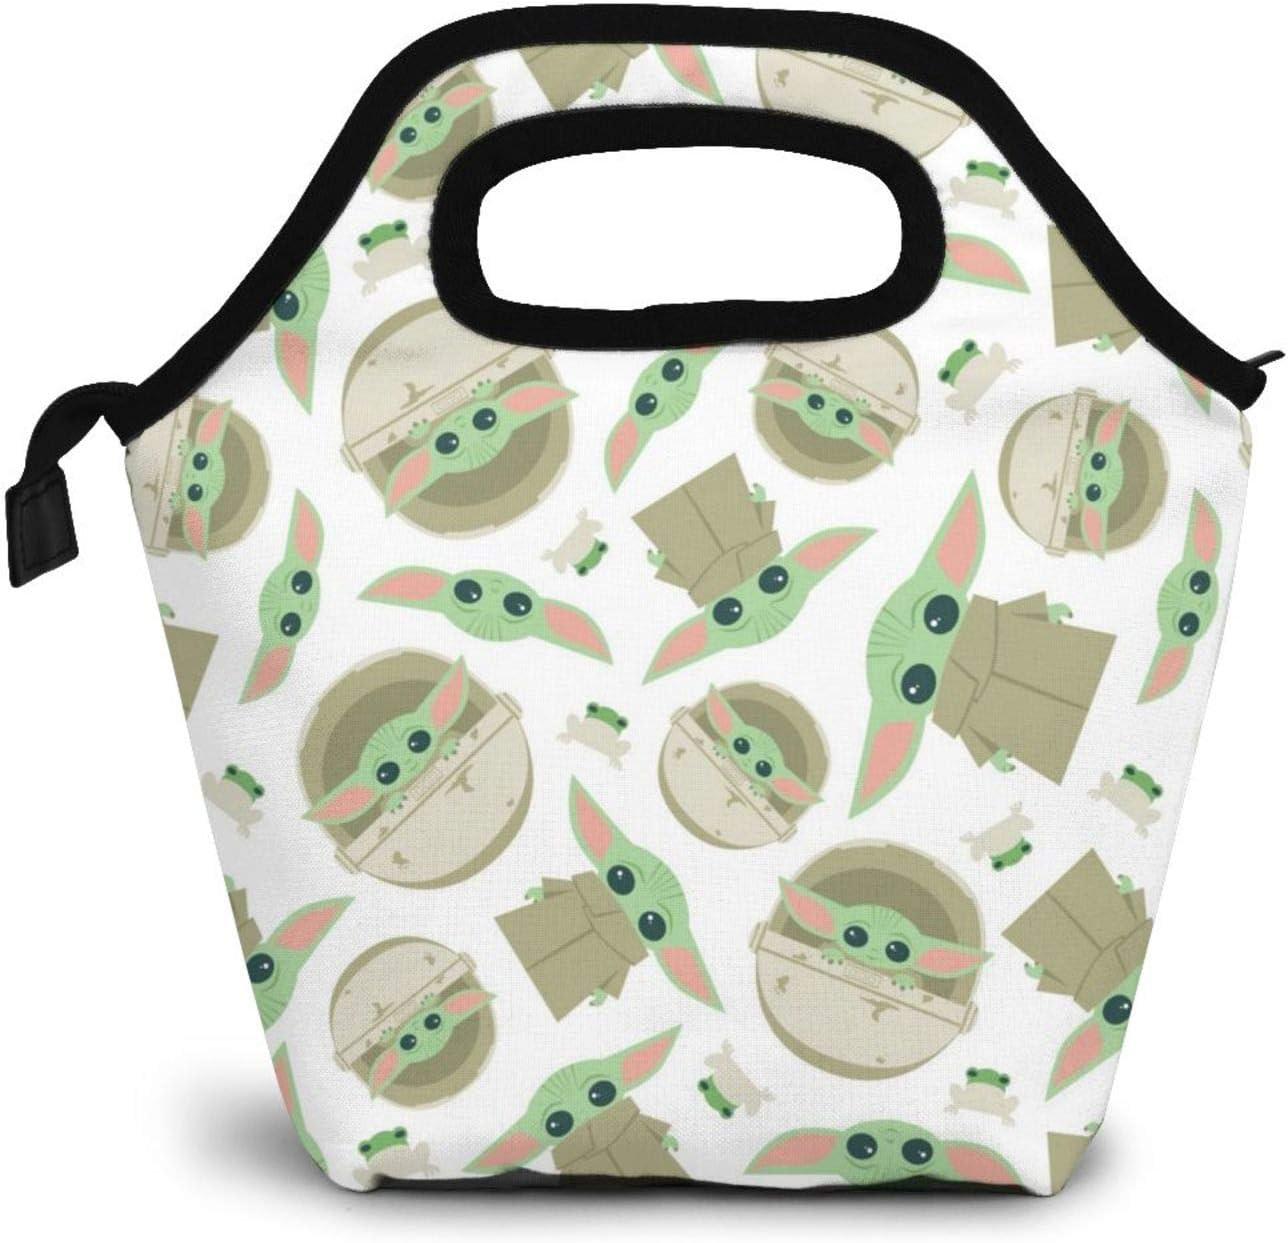 Yo-da baby Tote Bag Lunch Bag Lnsulated Lunch Cooler Bag for Women/Men One Size